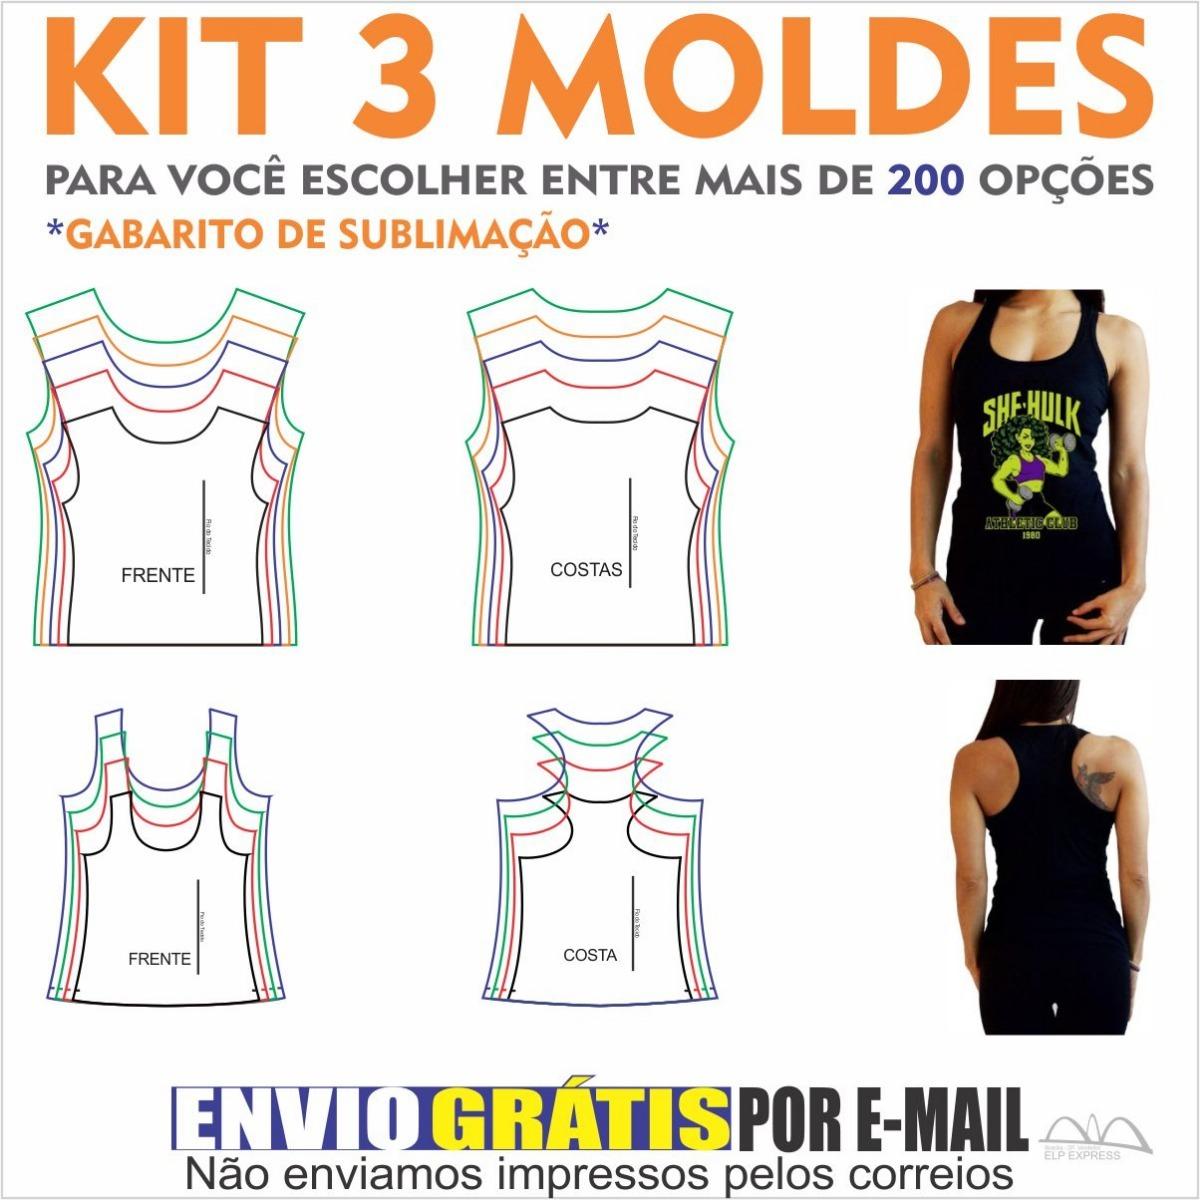 02f47544f8 Kit 3 Moldes De Roupas A Sua Escolha. Camisas